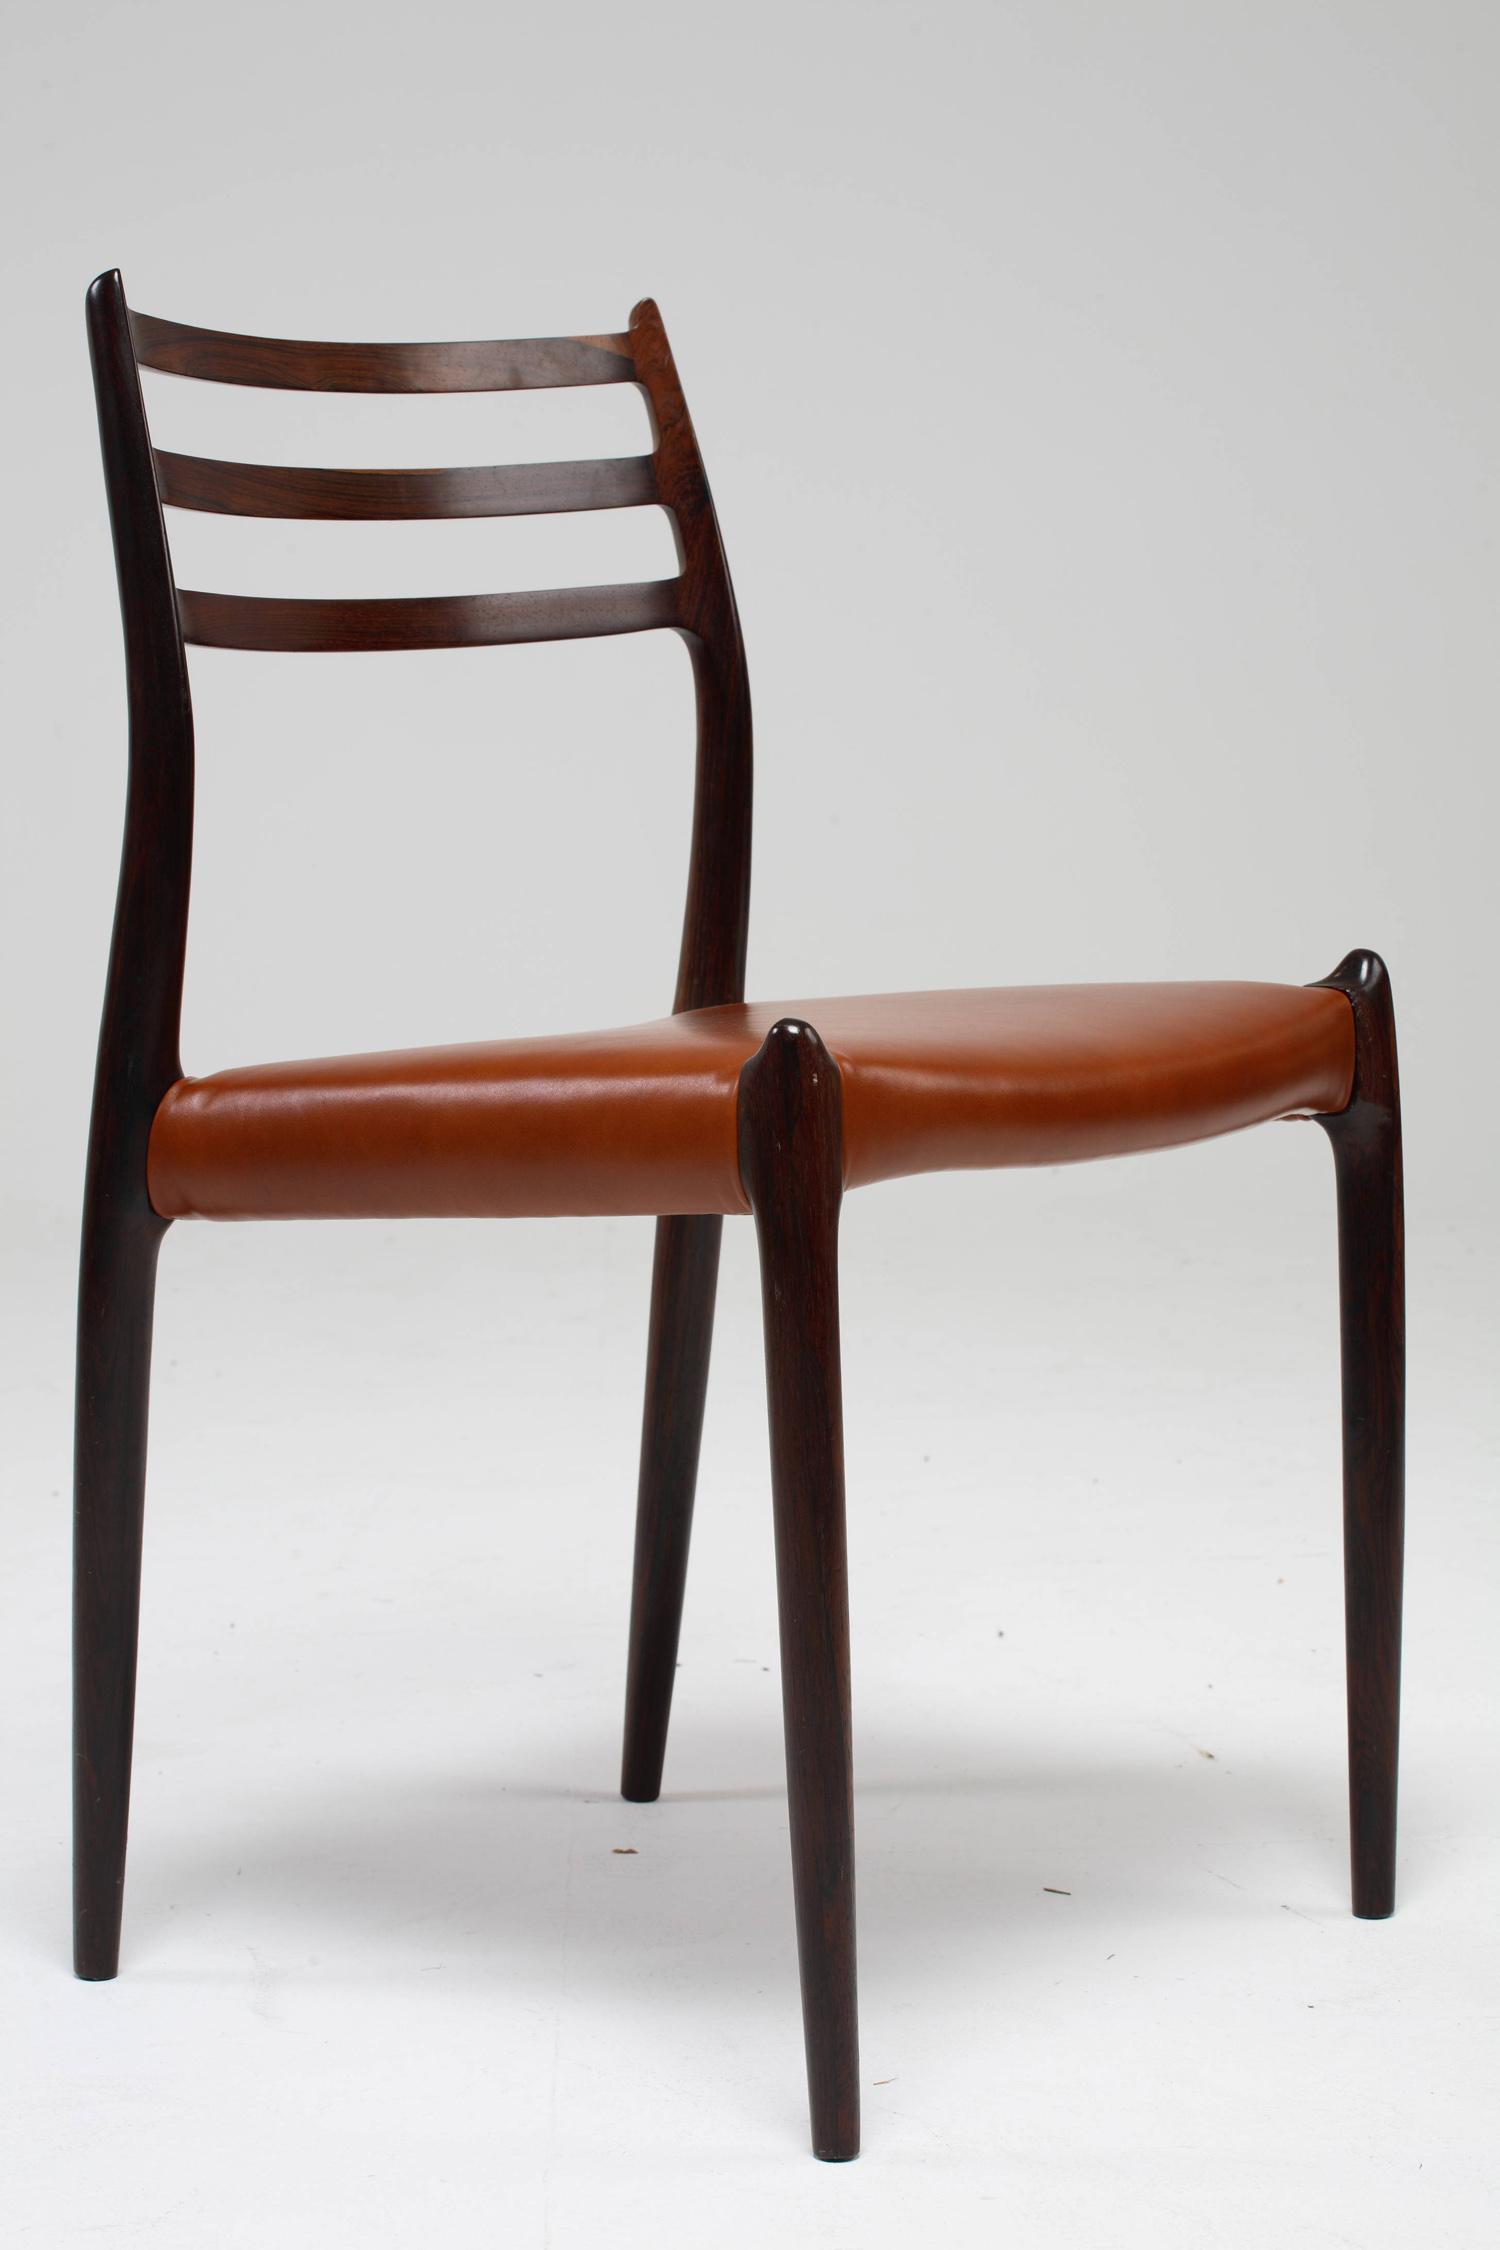 Chair_4_002_resize.jpg